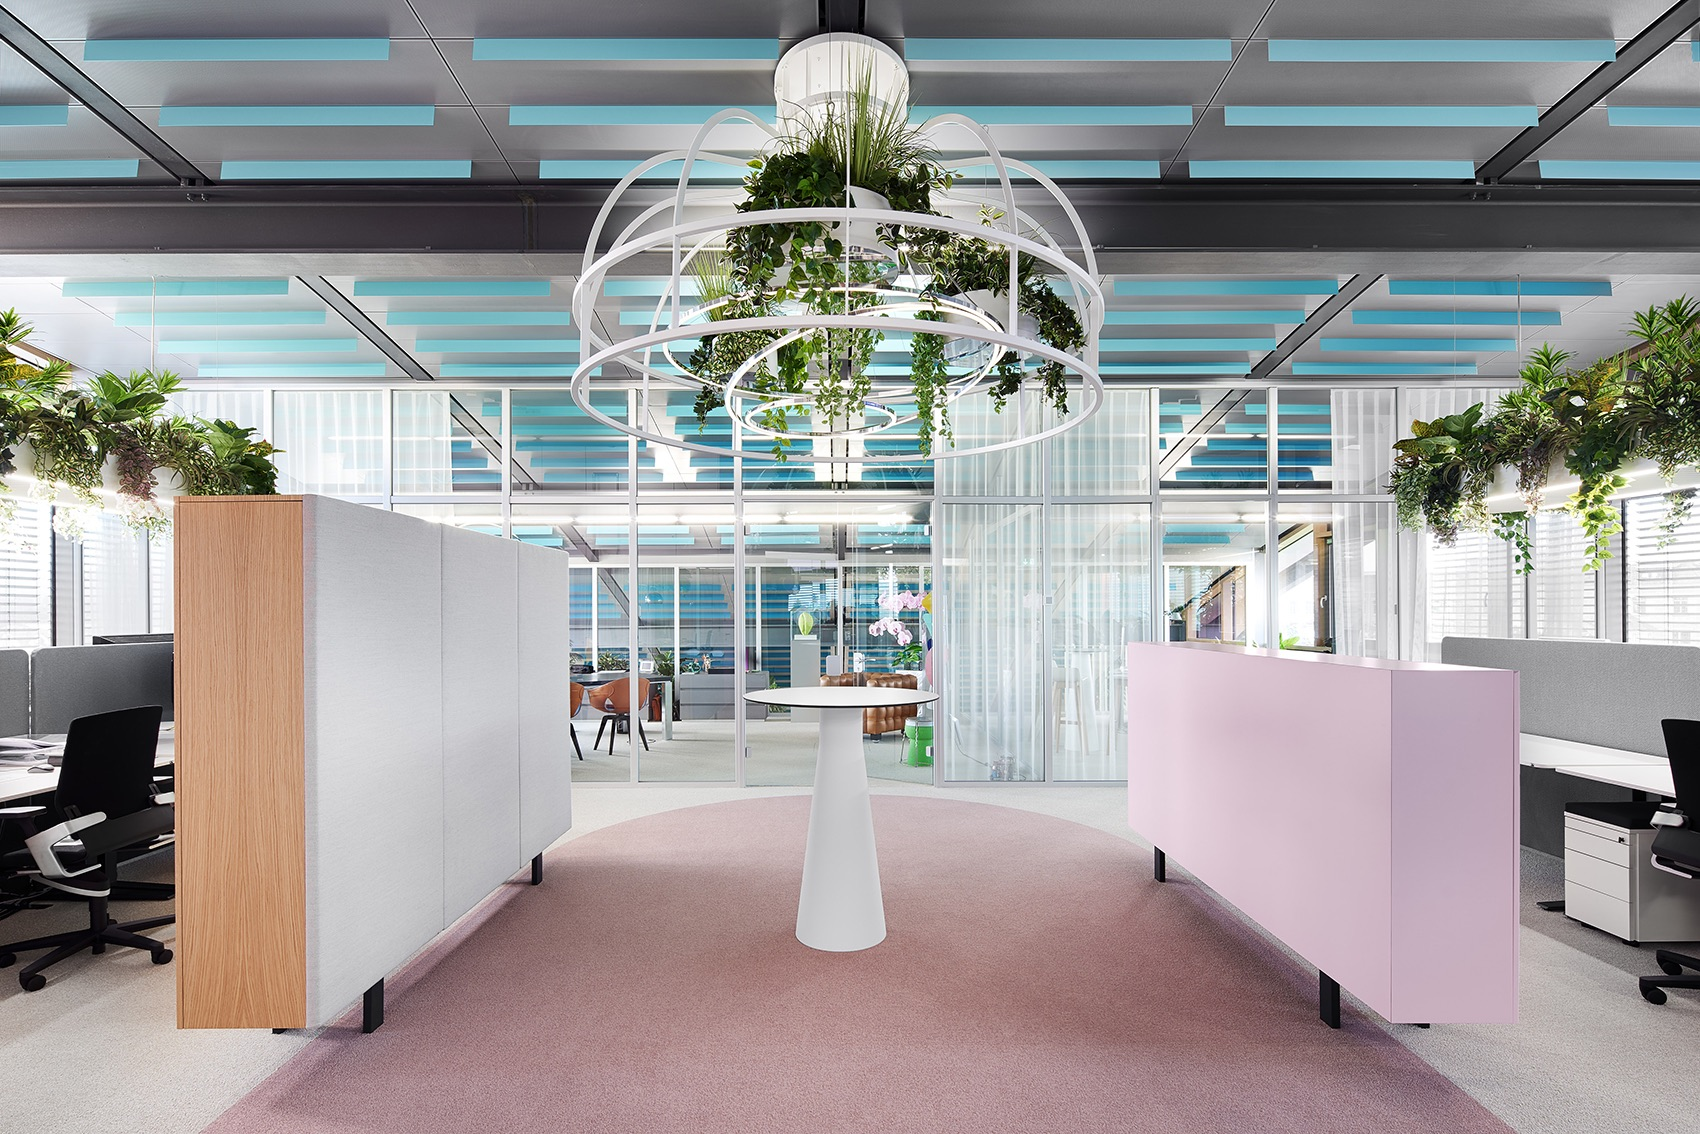 roman-klis-design-office-11